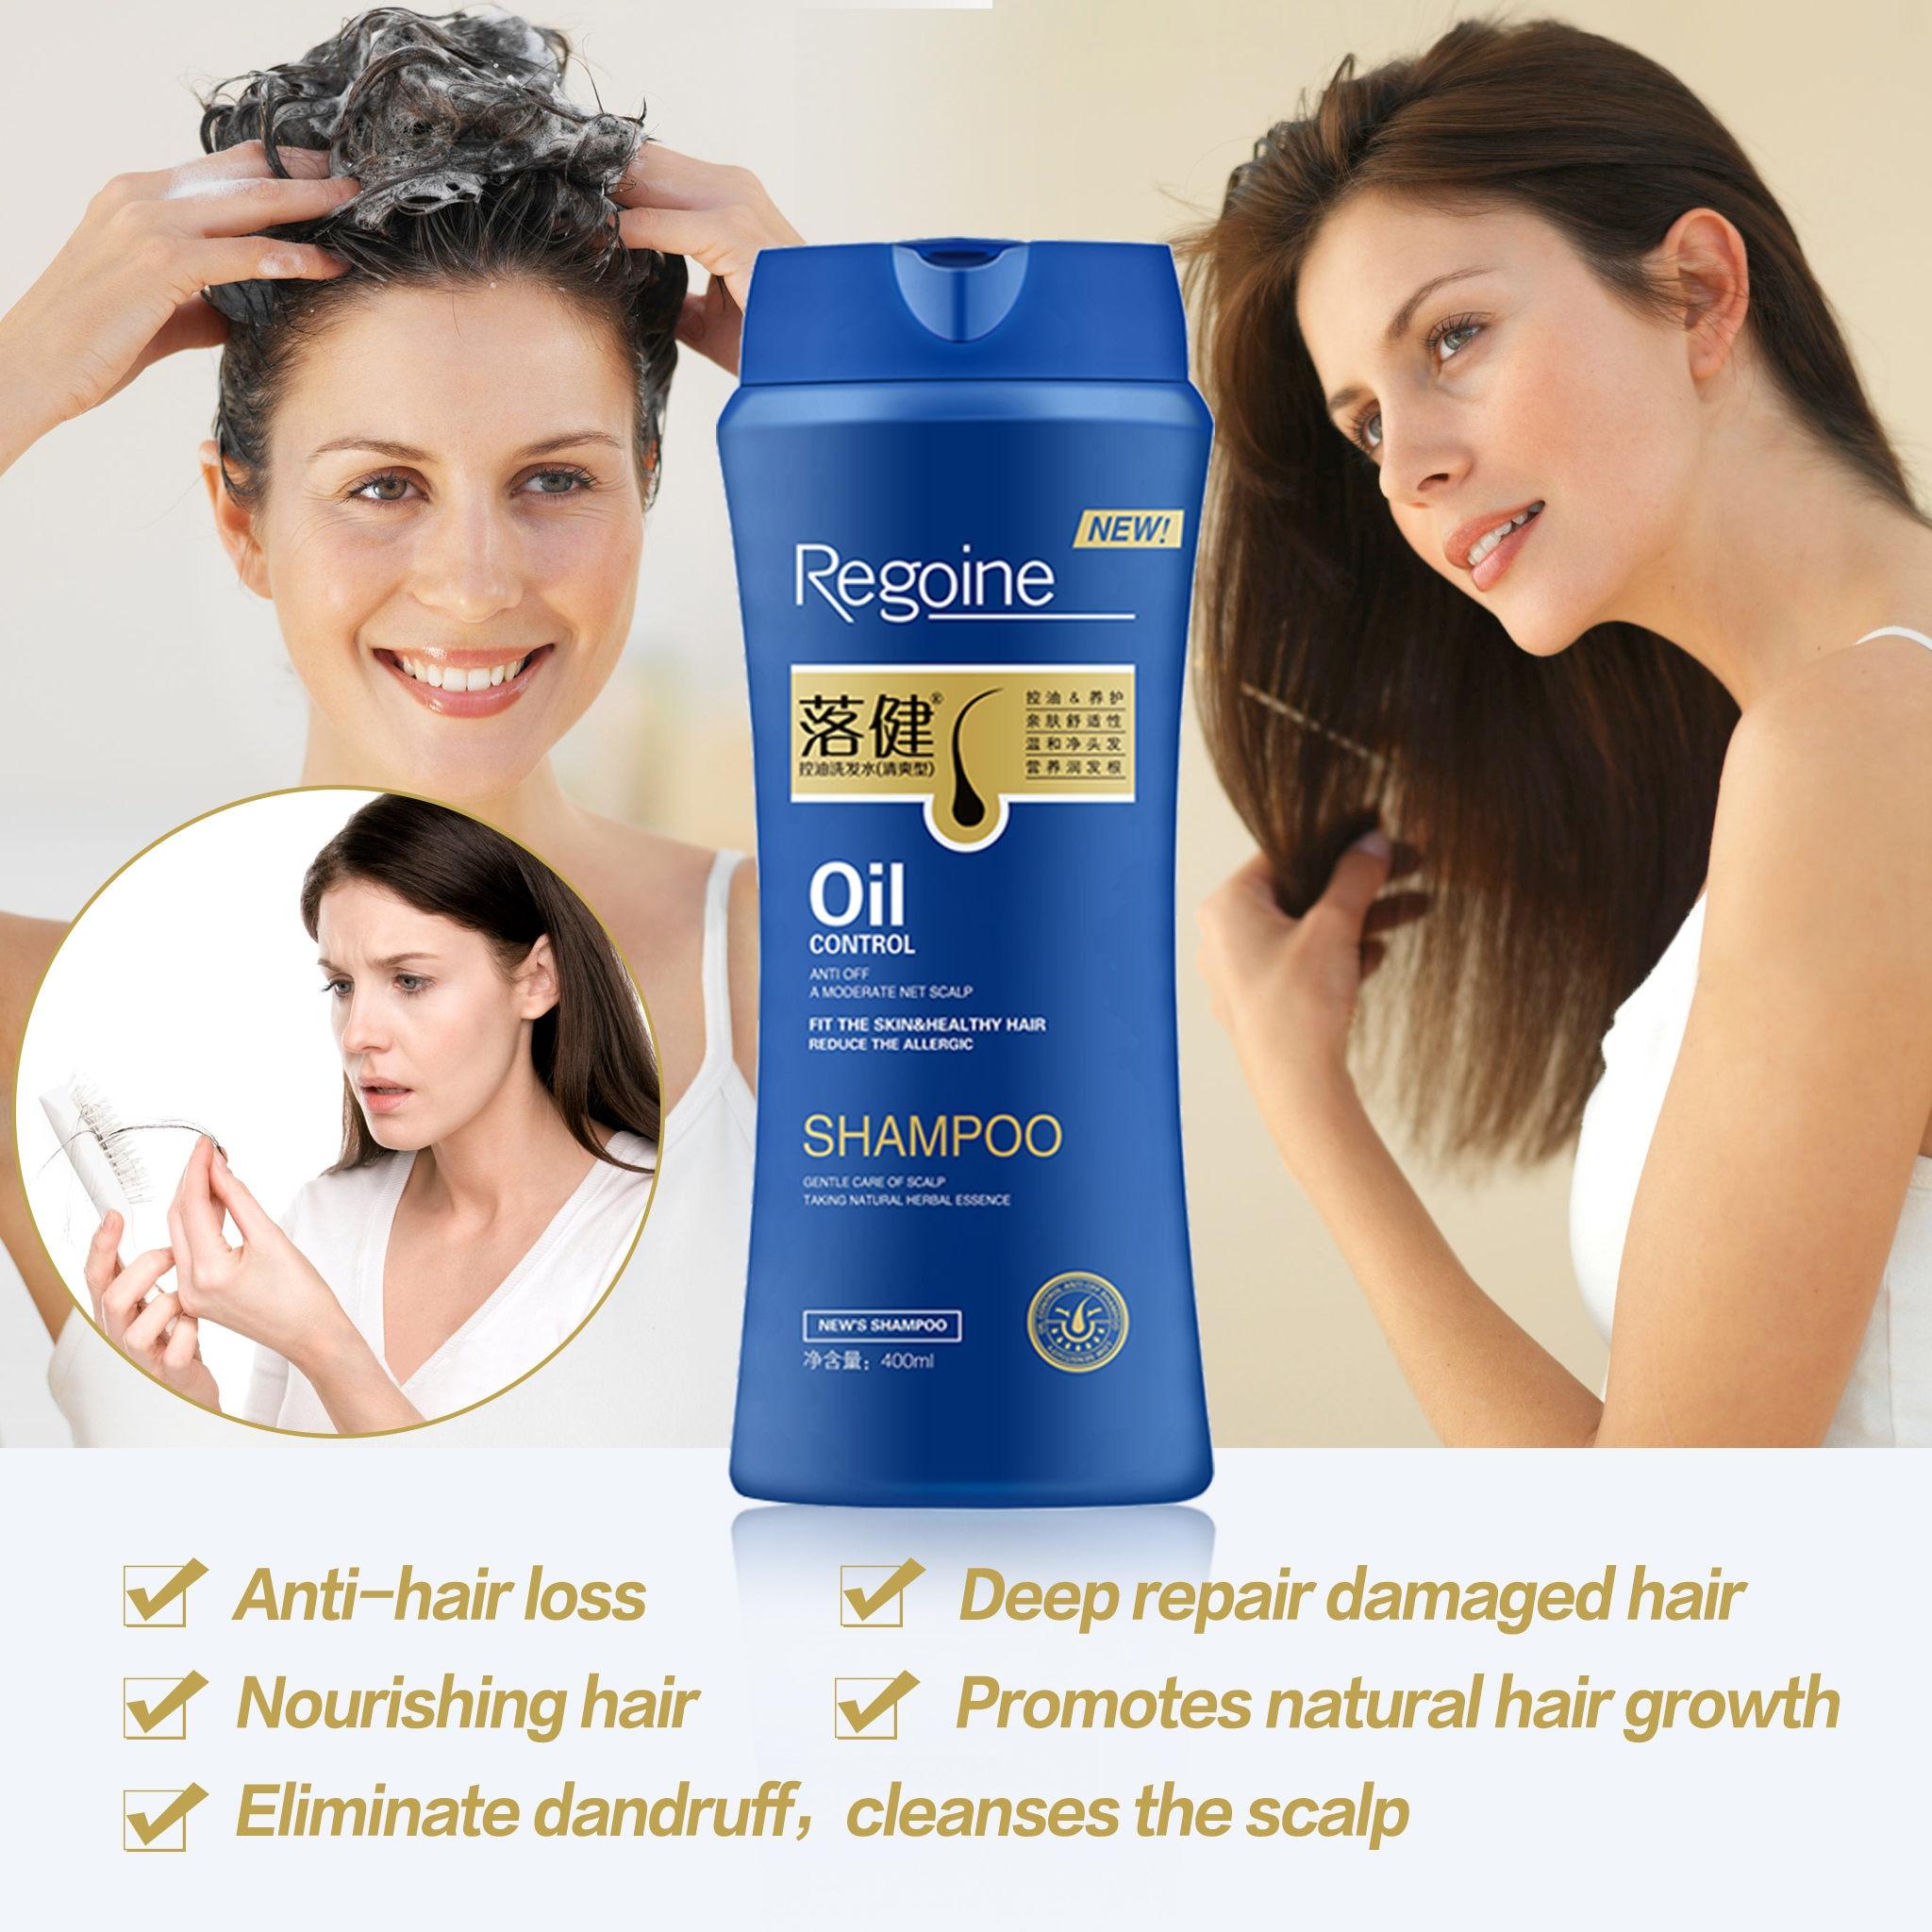 Anti Hair Loss Shampoo Promotes Hair Growth Oil Control Deep Cleansing  Nourishing Scalp and Hair Root Shampoo 9ml